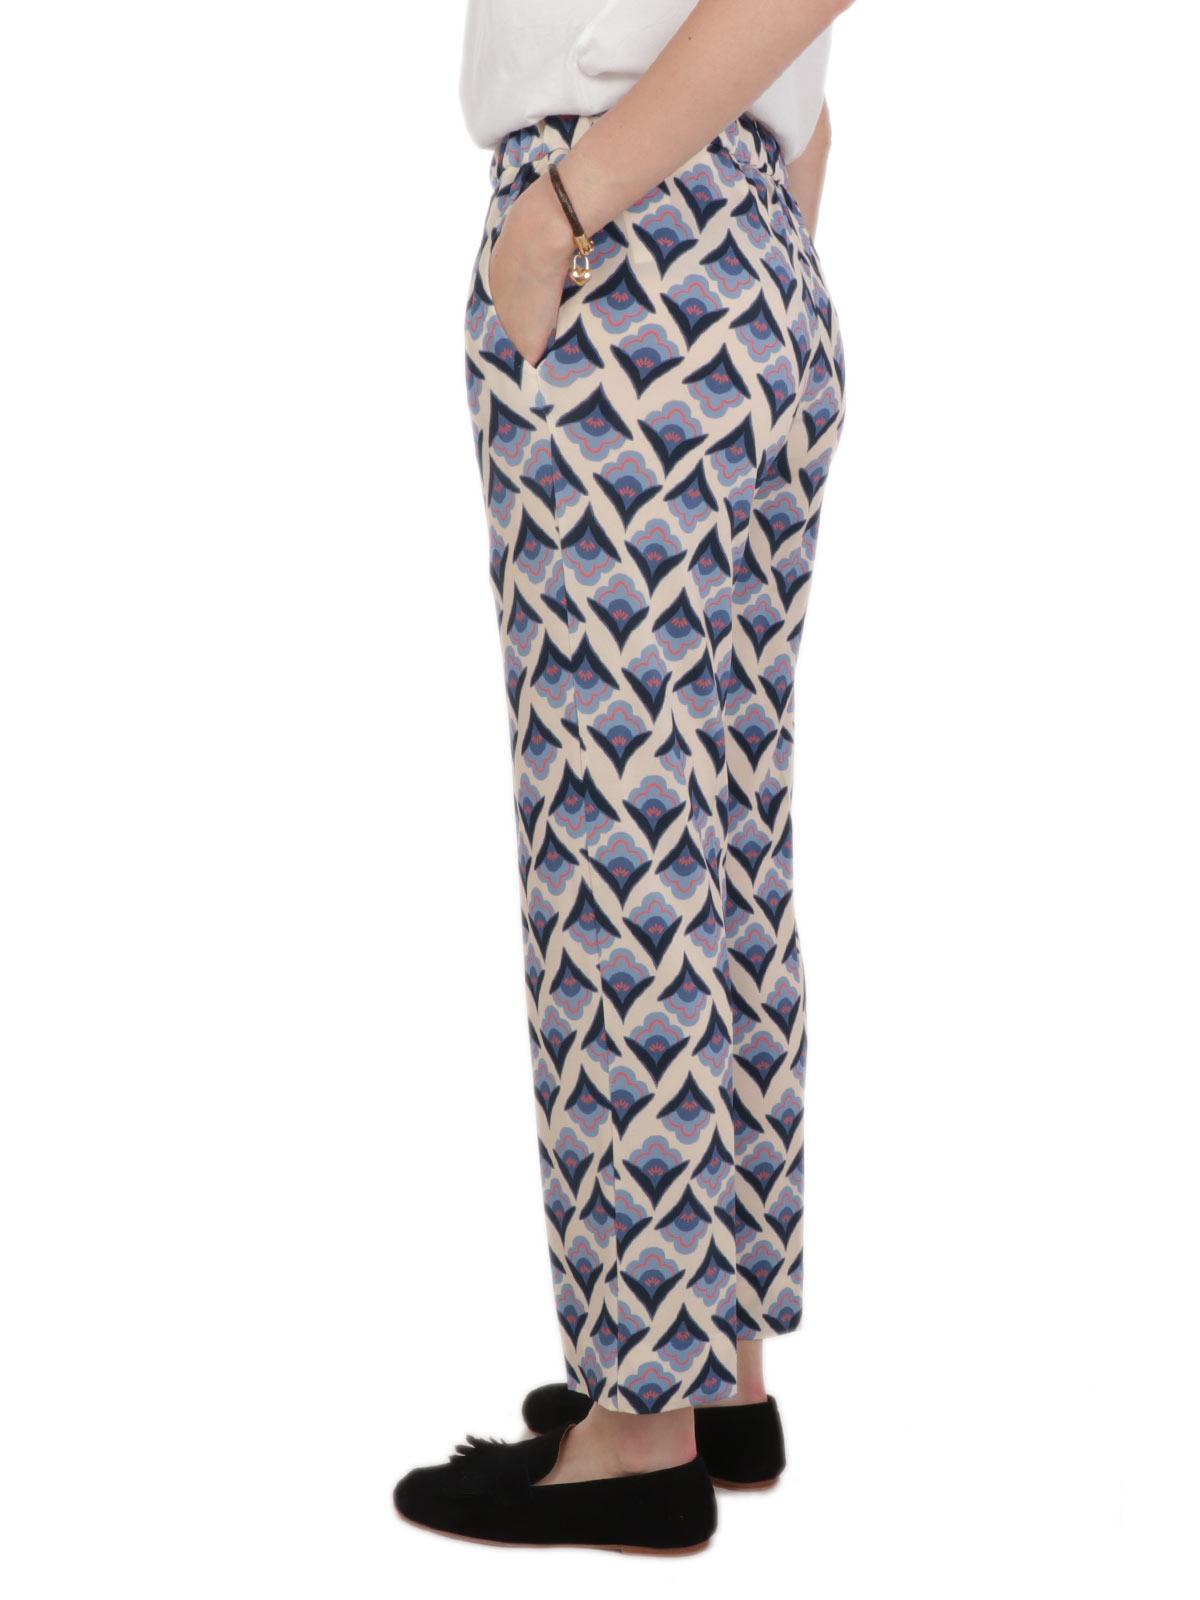 Immagine di VIA MASINI 80 | Pantalone Donna Fantasia